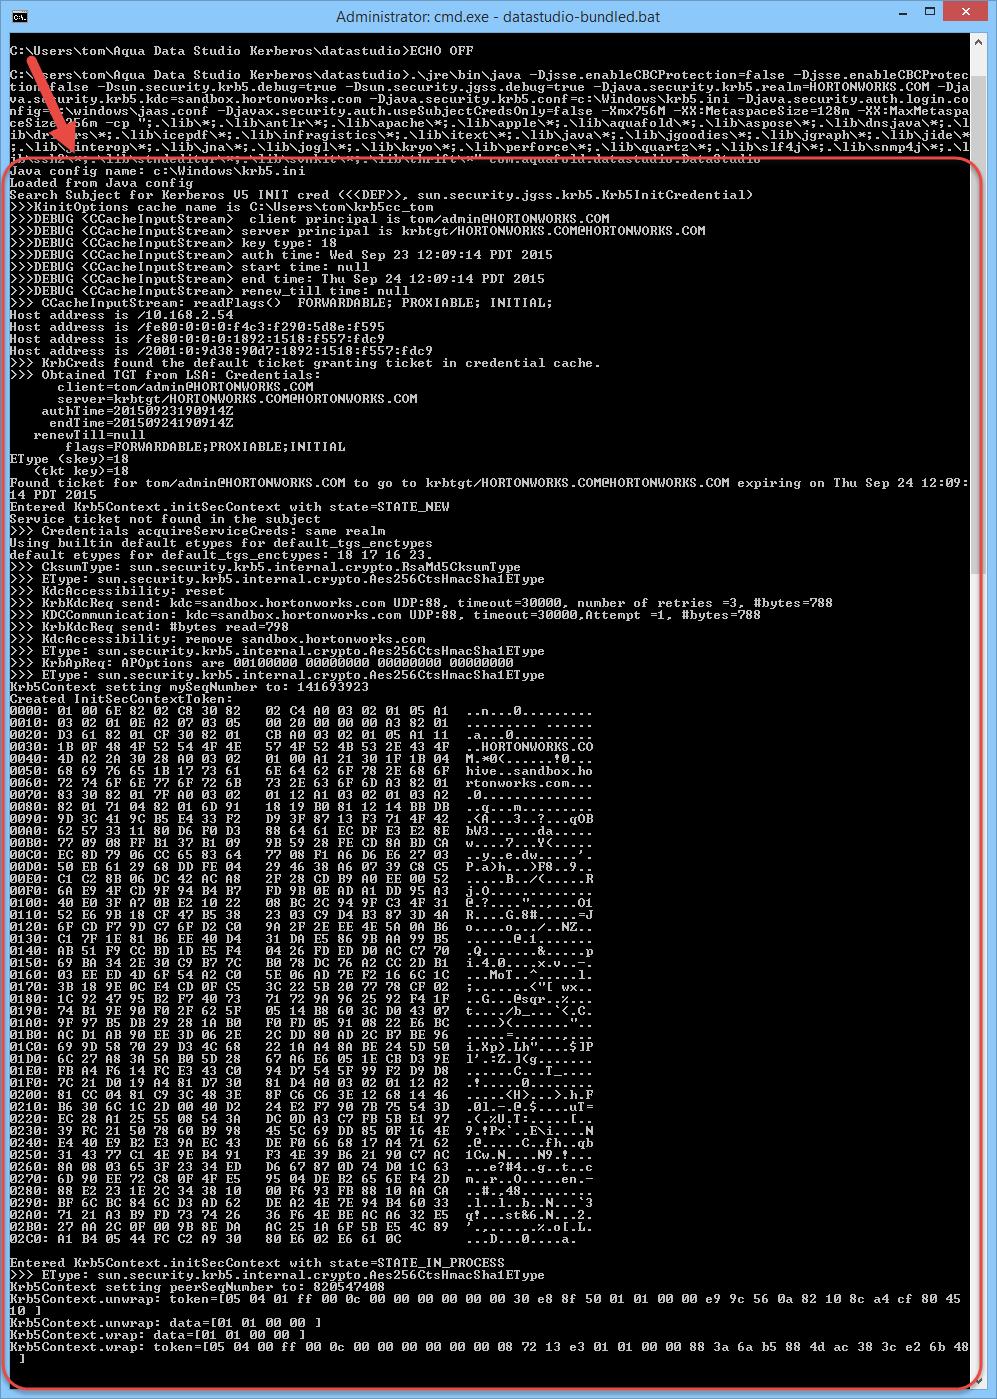 Kerberos Configuration | Documentation 18 0 | Aqua Data Studio